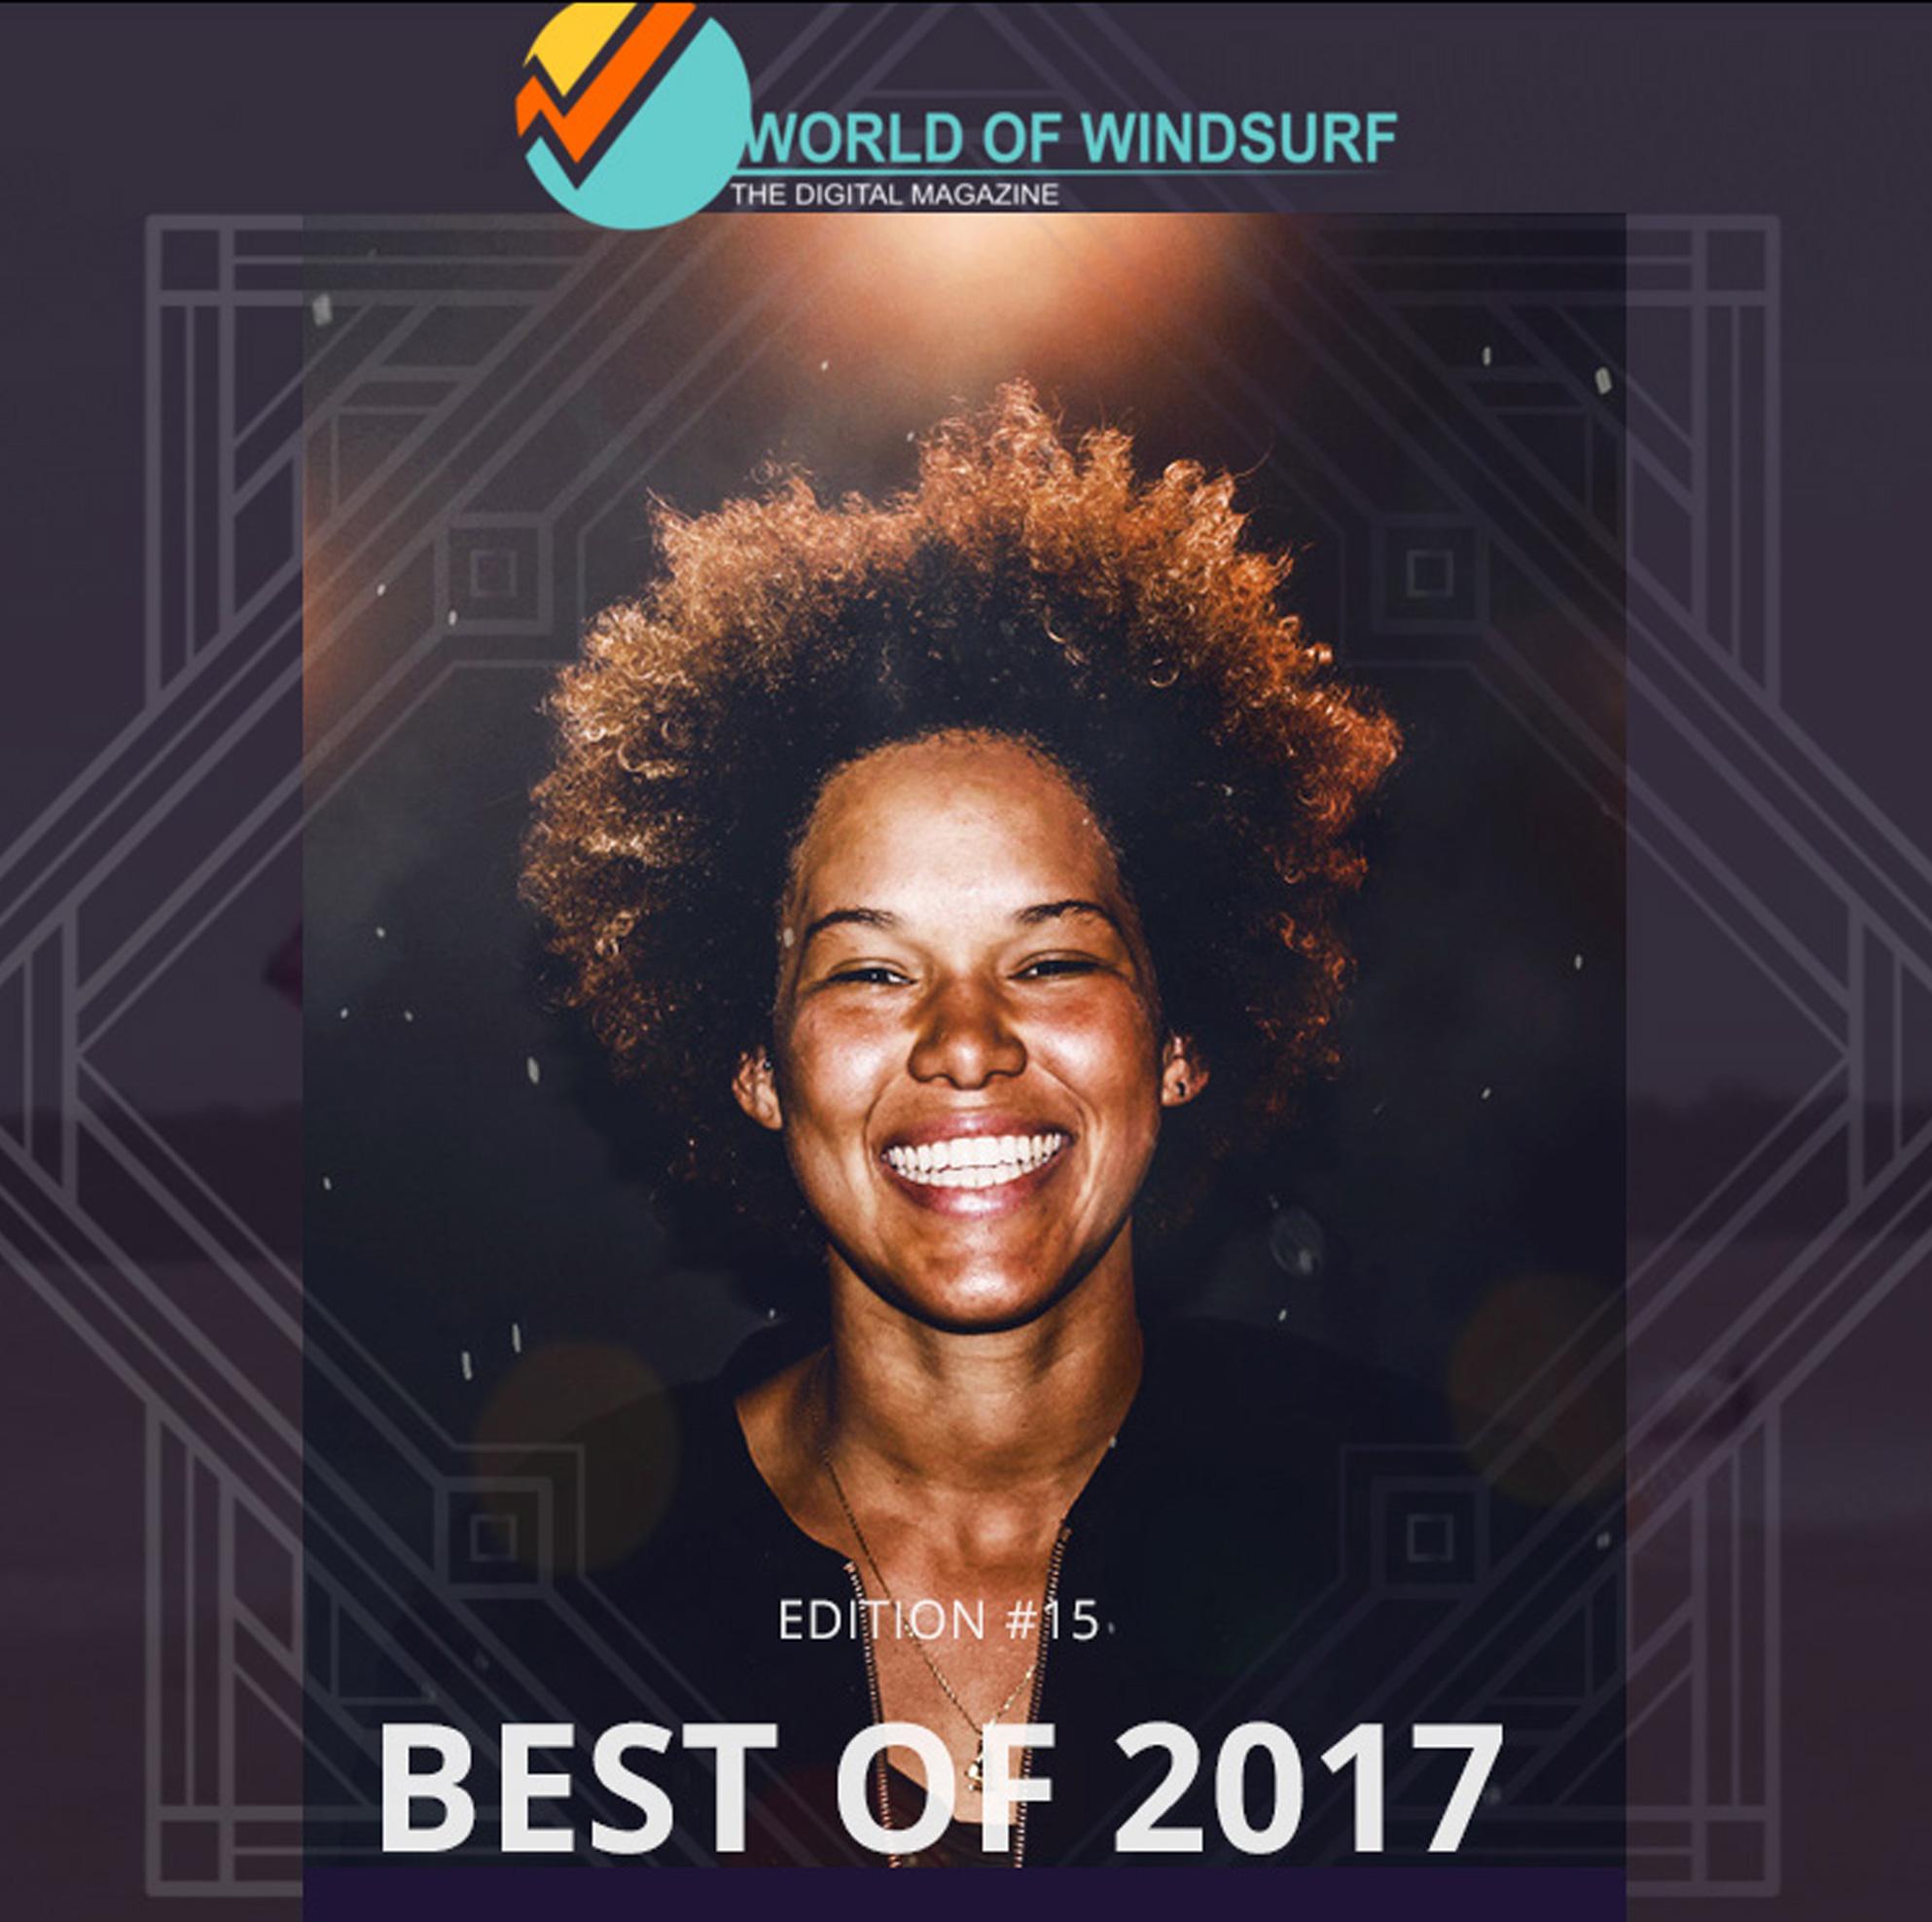 15-bestof2017_emag_crp20